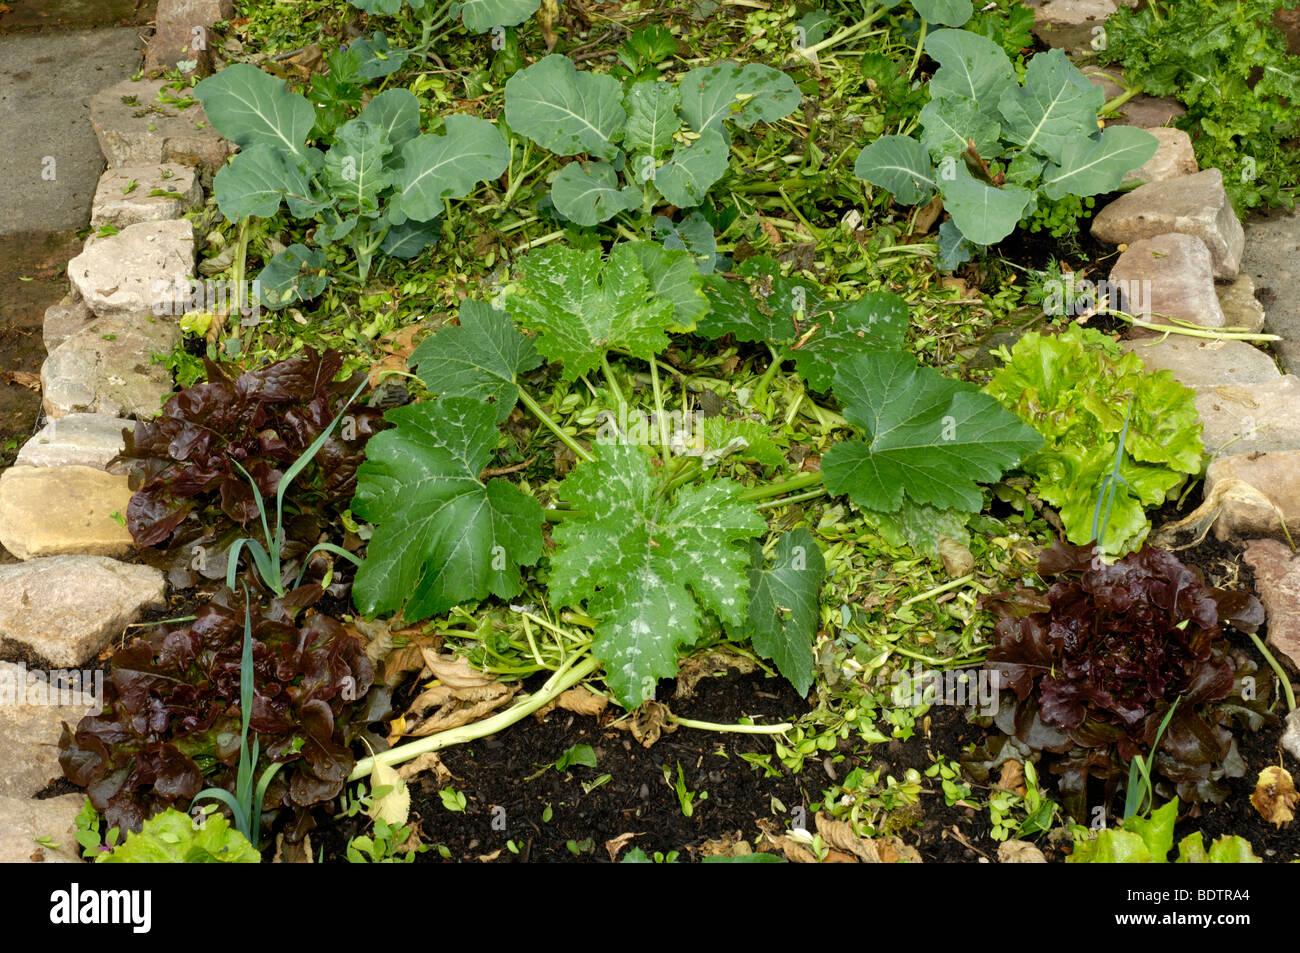 Gemuesebeet mit Salat und Kohl, Bed of vegetables - mulch - Stock Image